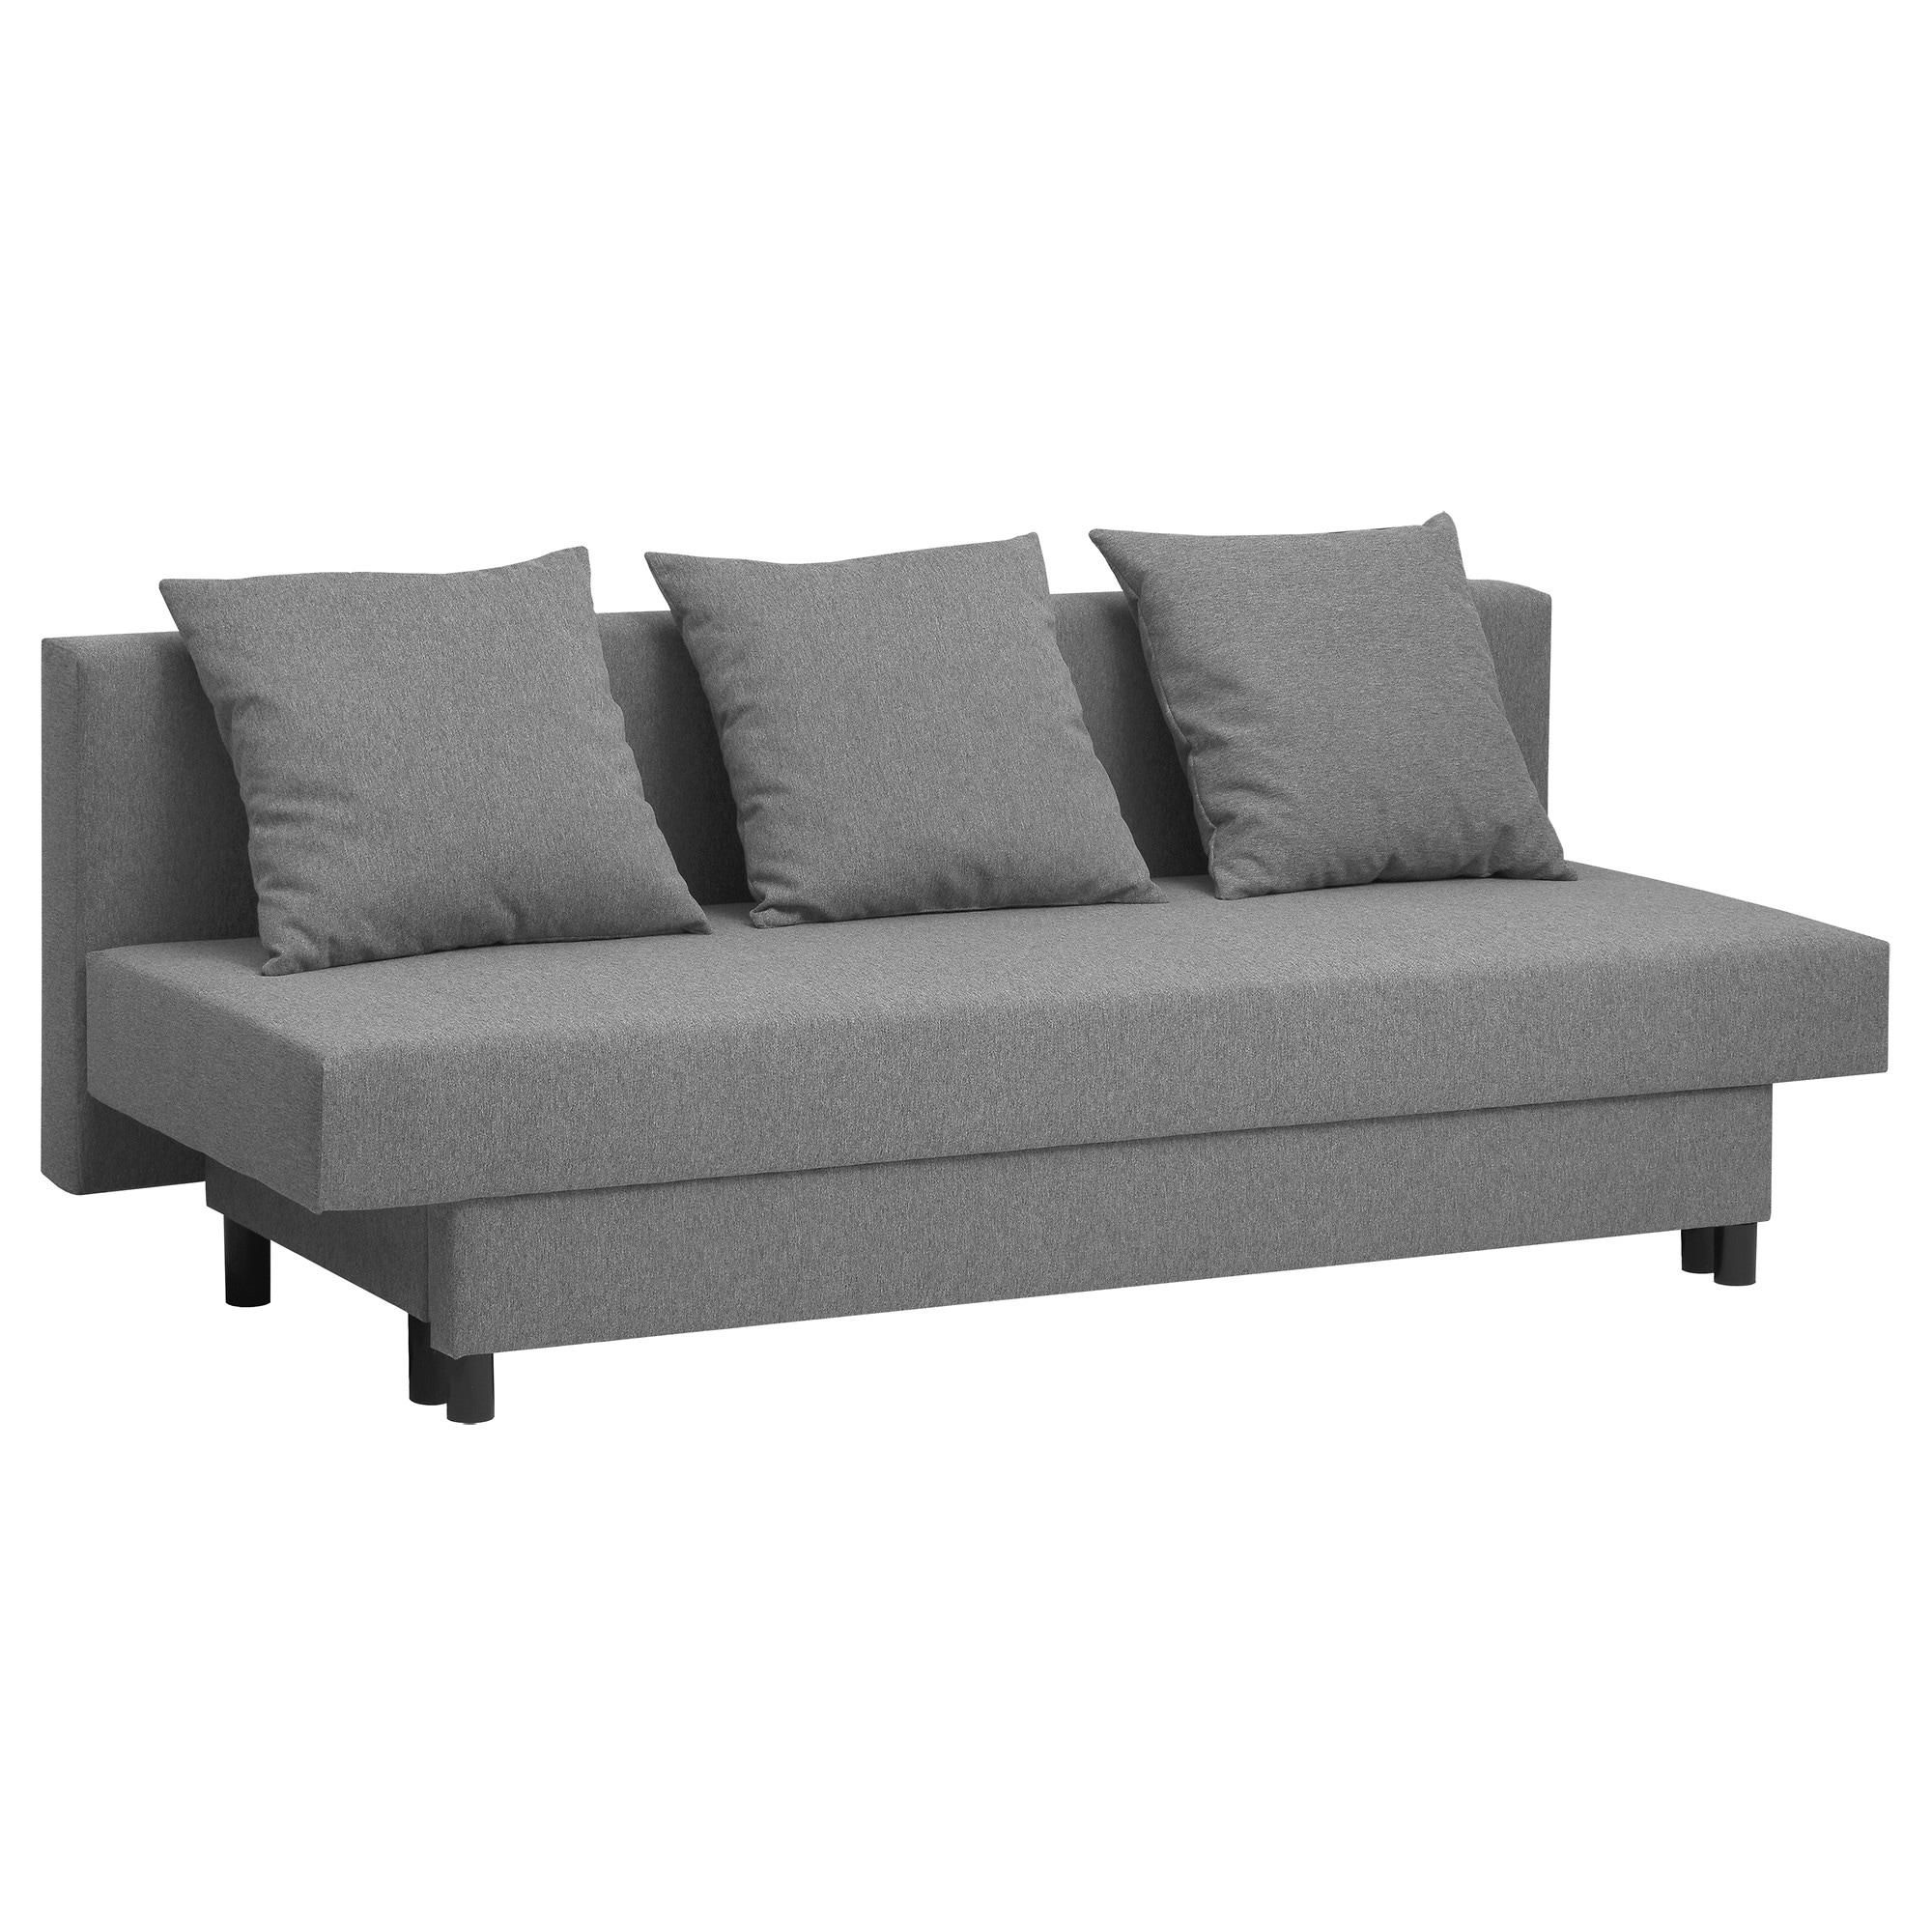 Sofas Baratos Ikea Mndw sofà S Y Sillones Pra Online Ikea